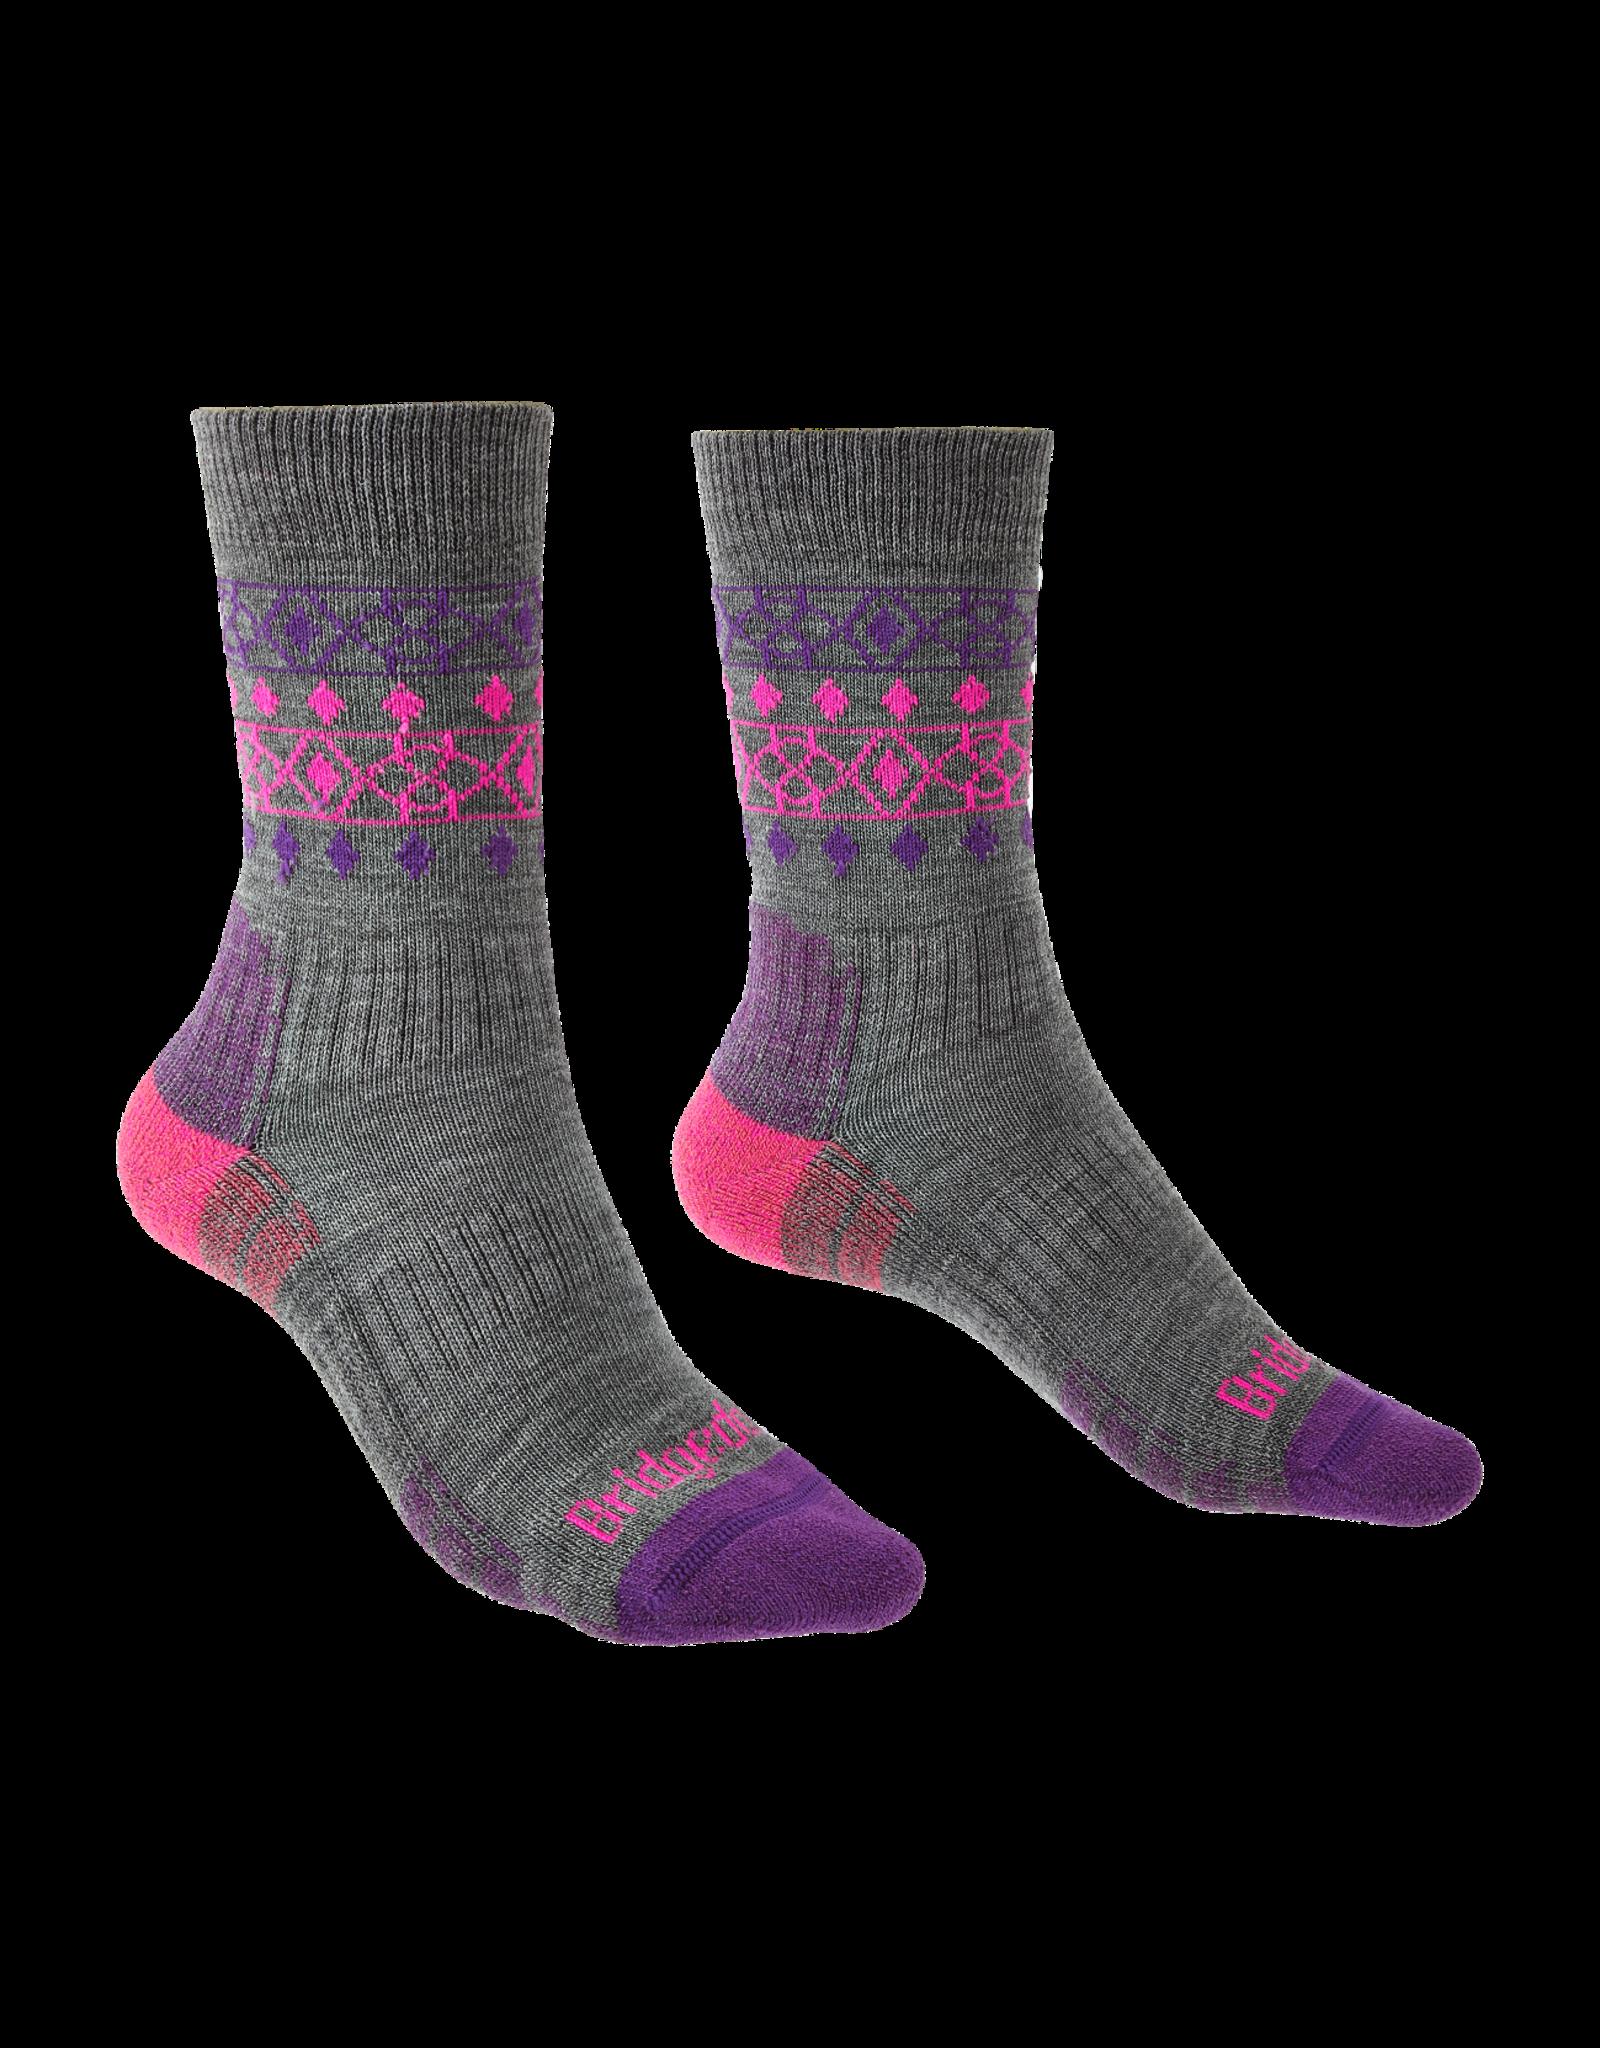 BRIDGEDALE Bridgedale Women's Lightweight Merino Endurance Hiking Socks Boot Height